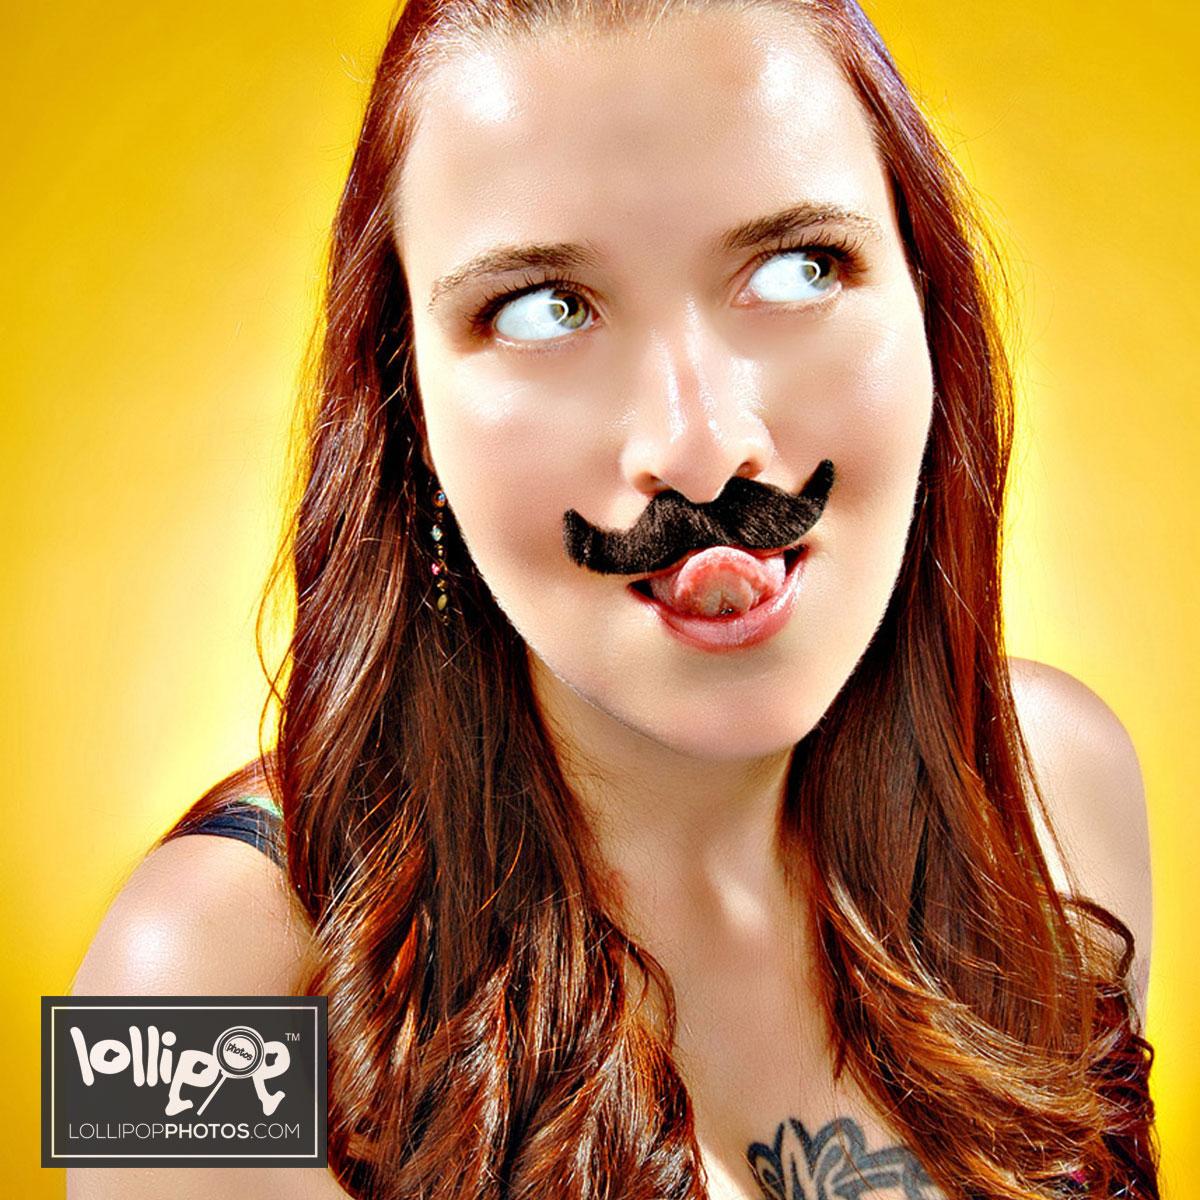 msdig-nora-canfield-lollipop-photos-429.jpg